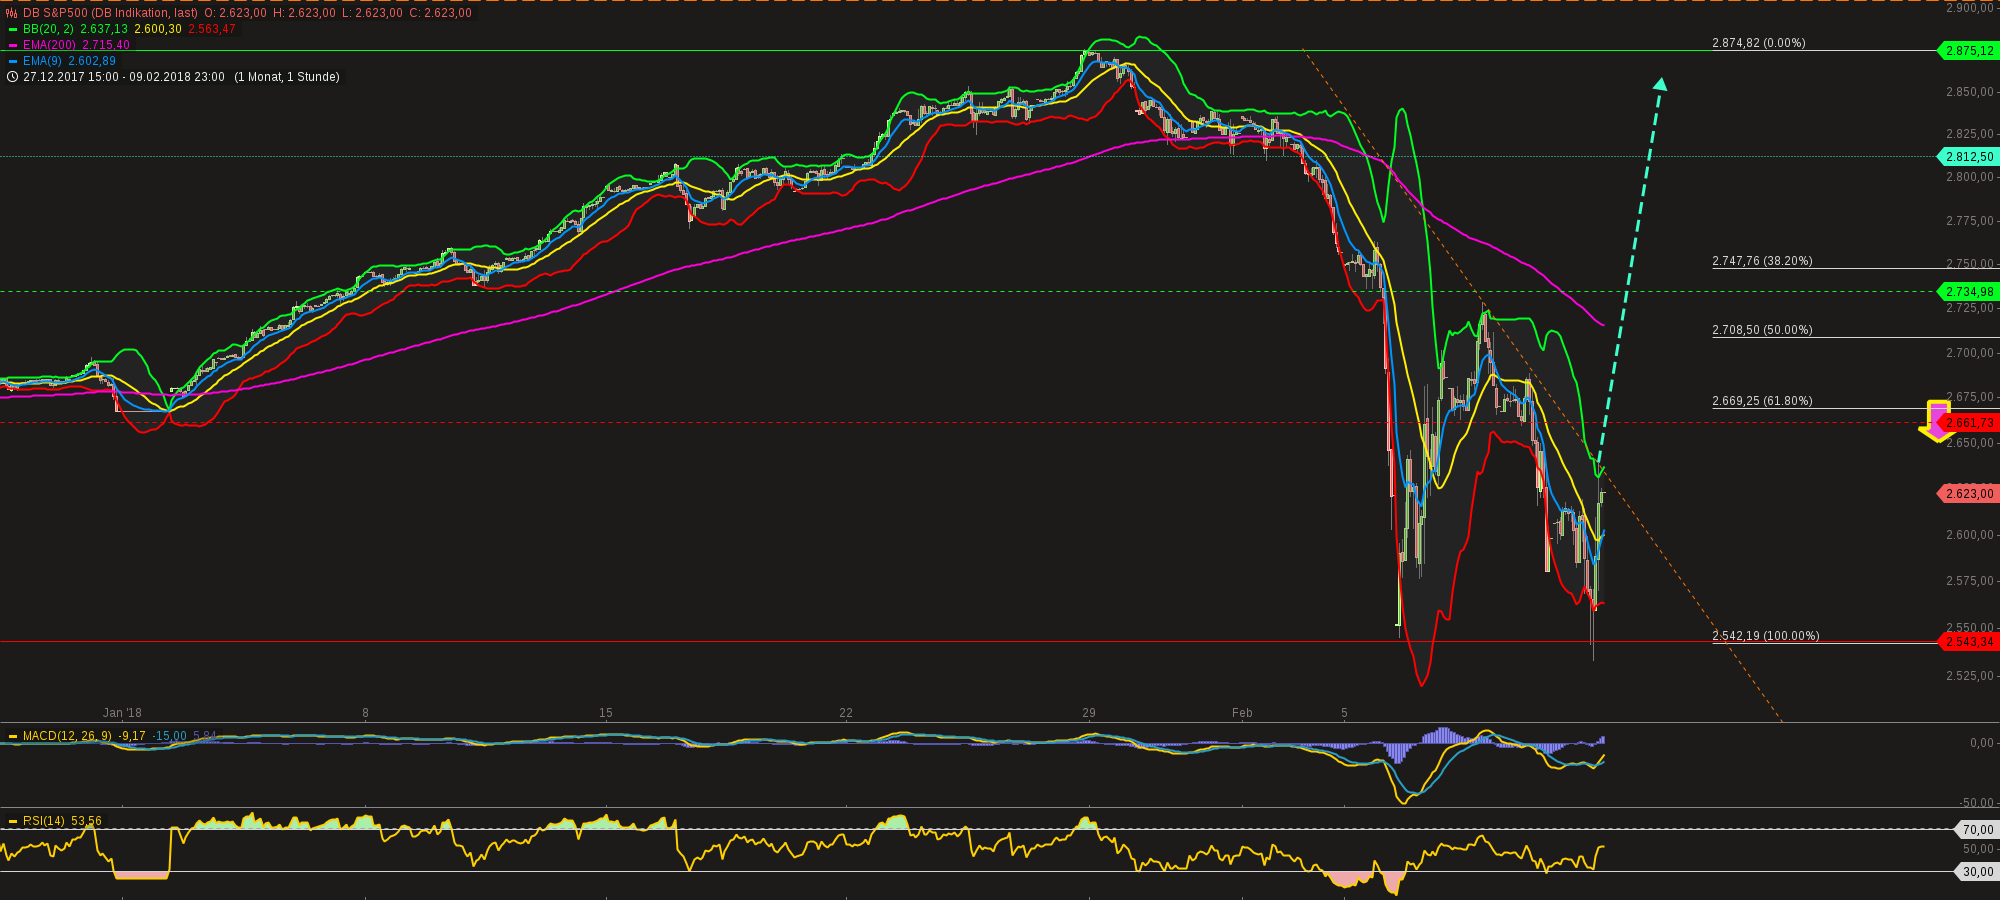 chart-11022018-1807-dbsp.png